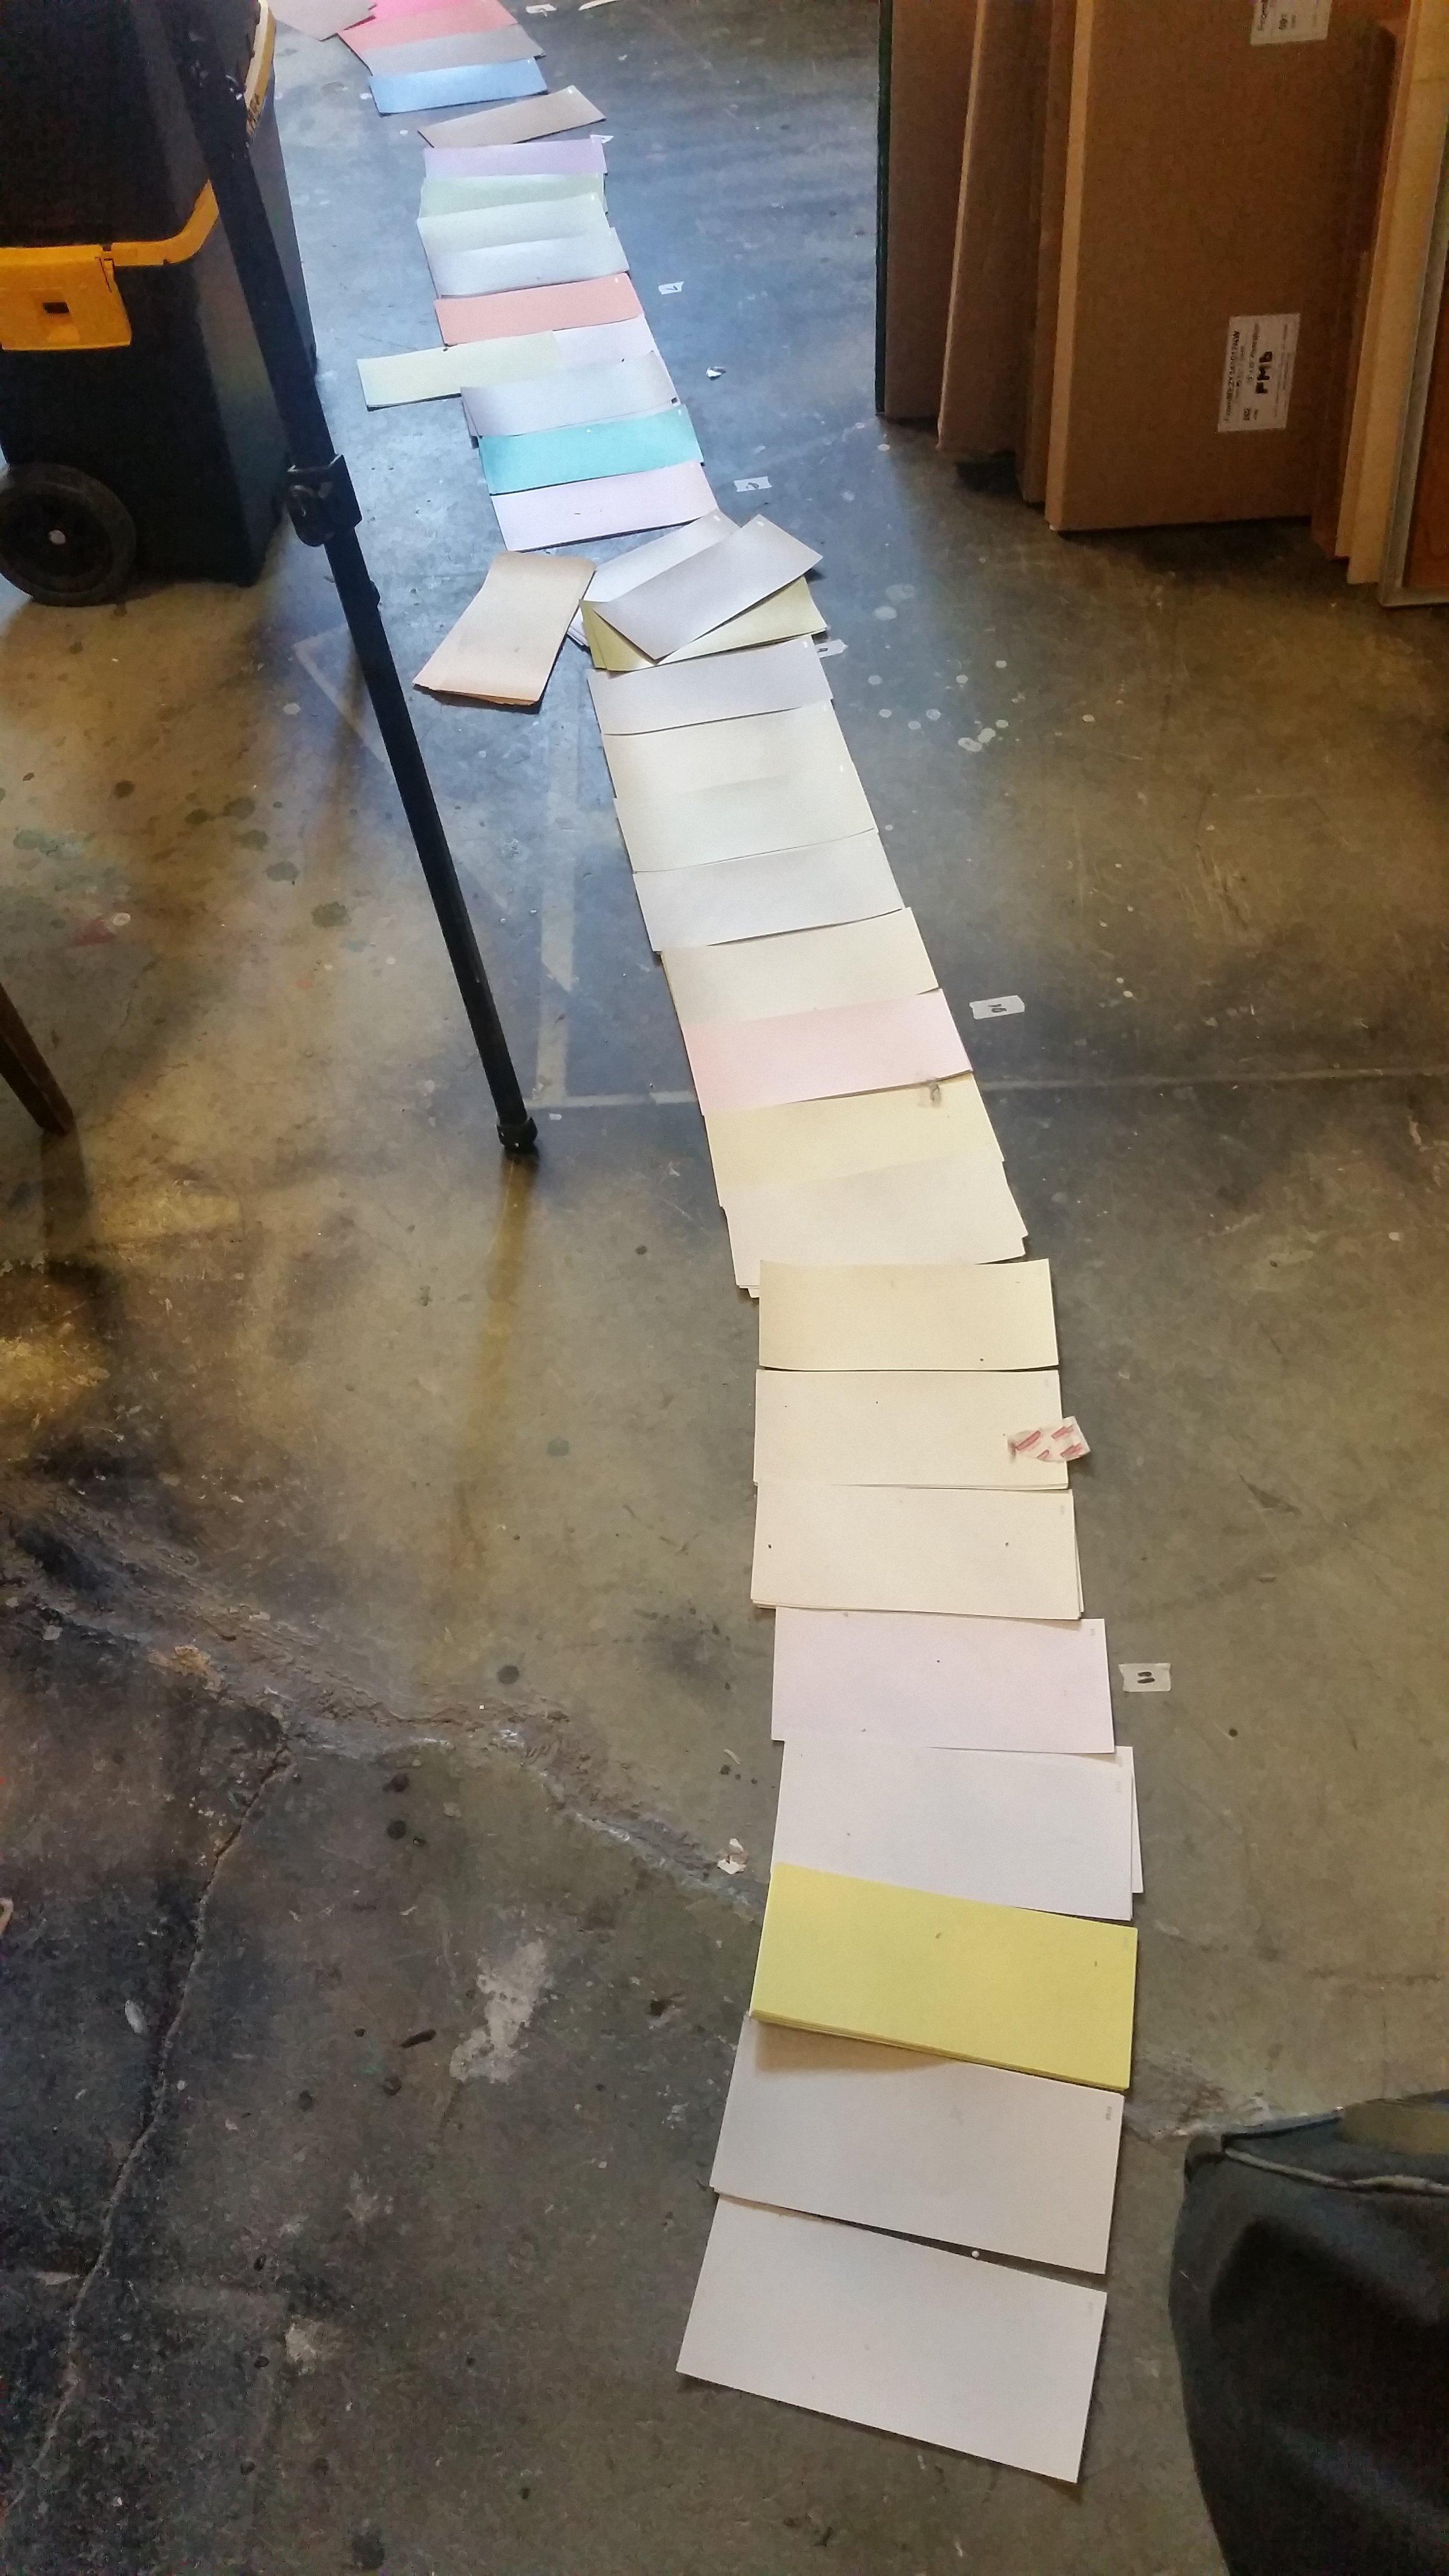 Paint chips on the studio floor.